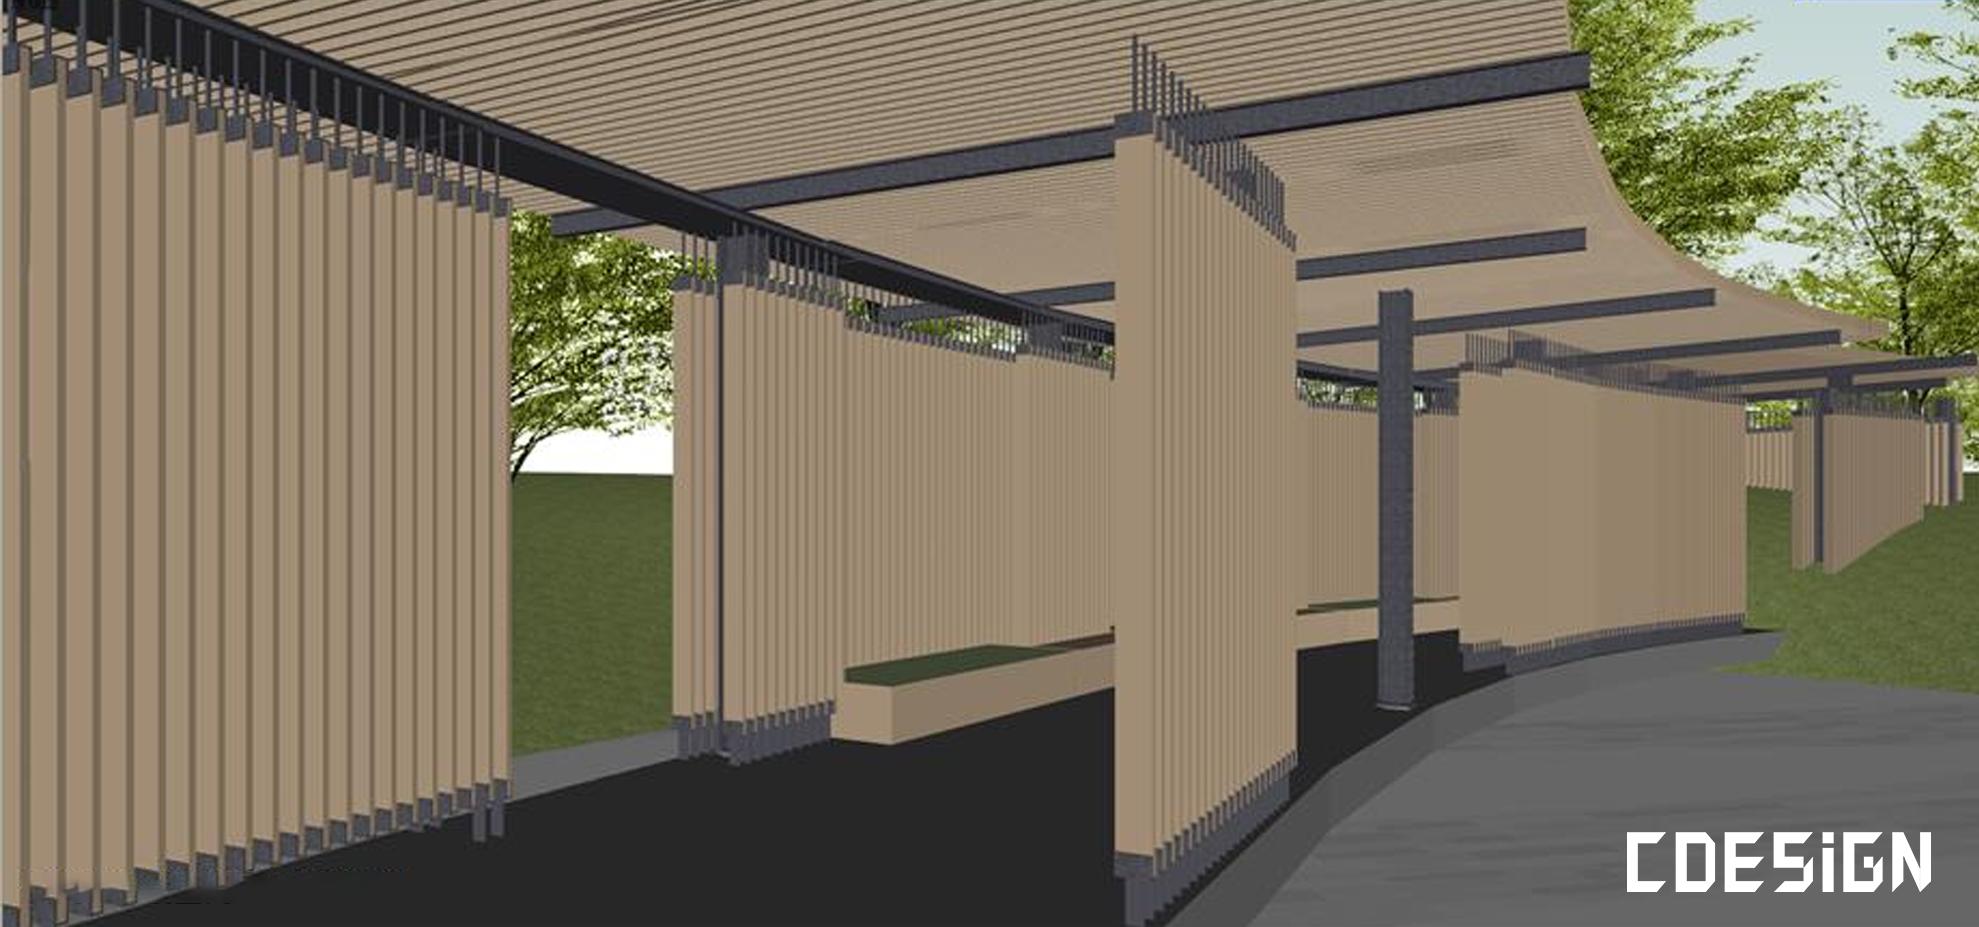 [SU]文化中心建筑设计方案su模型   建筑设计方案插图6-泛设计